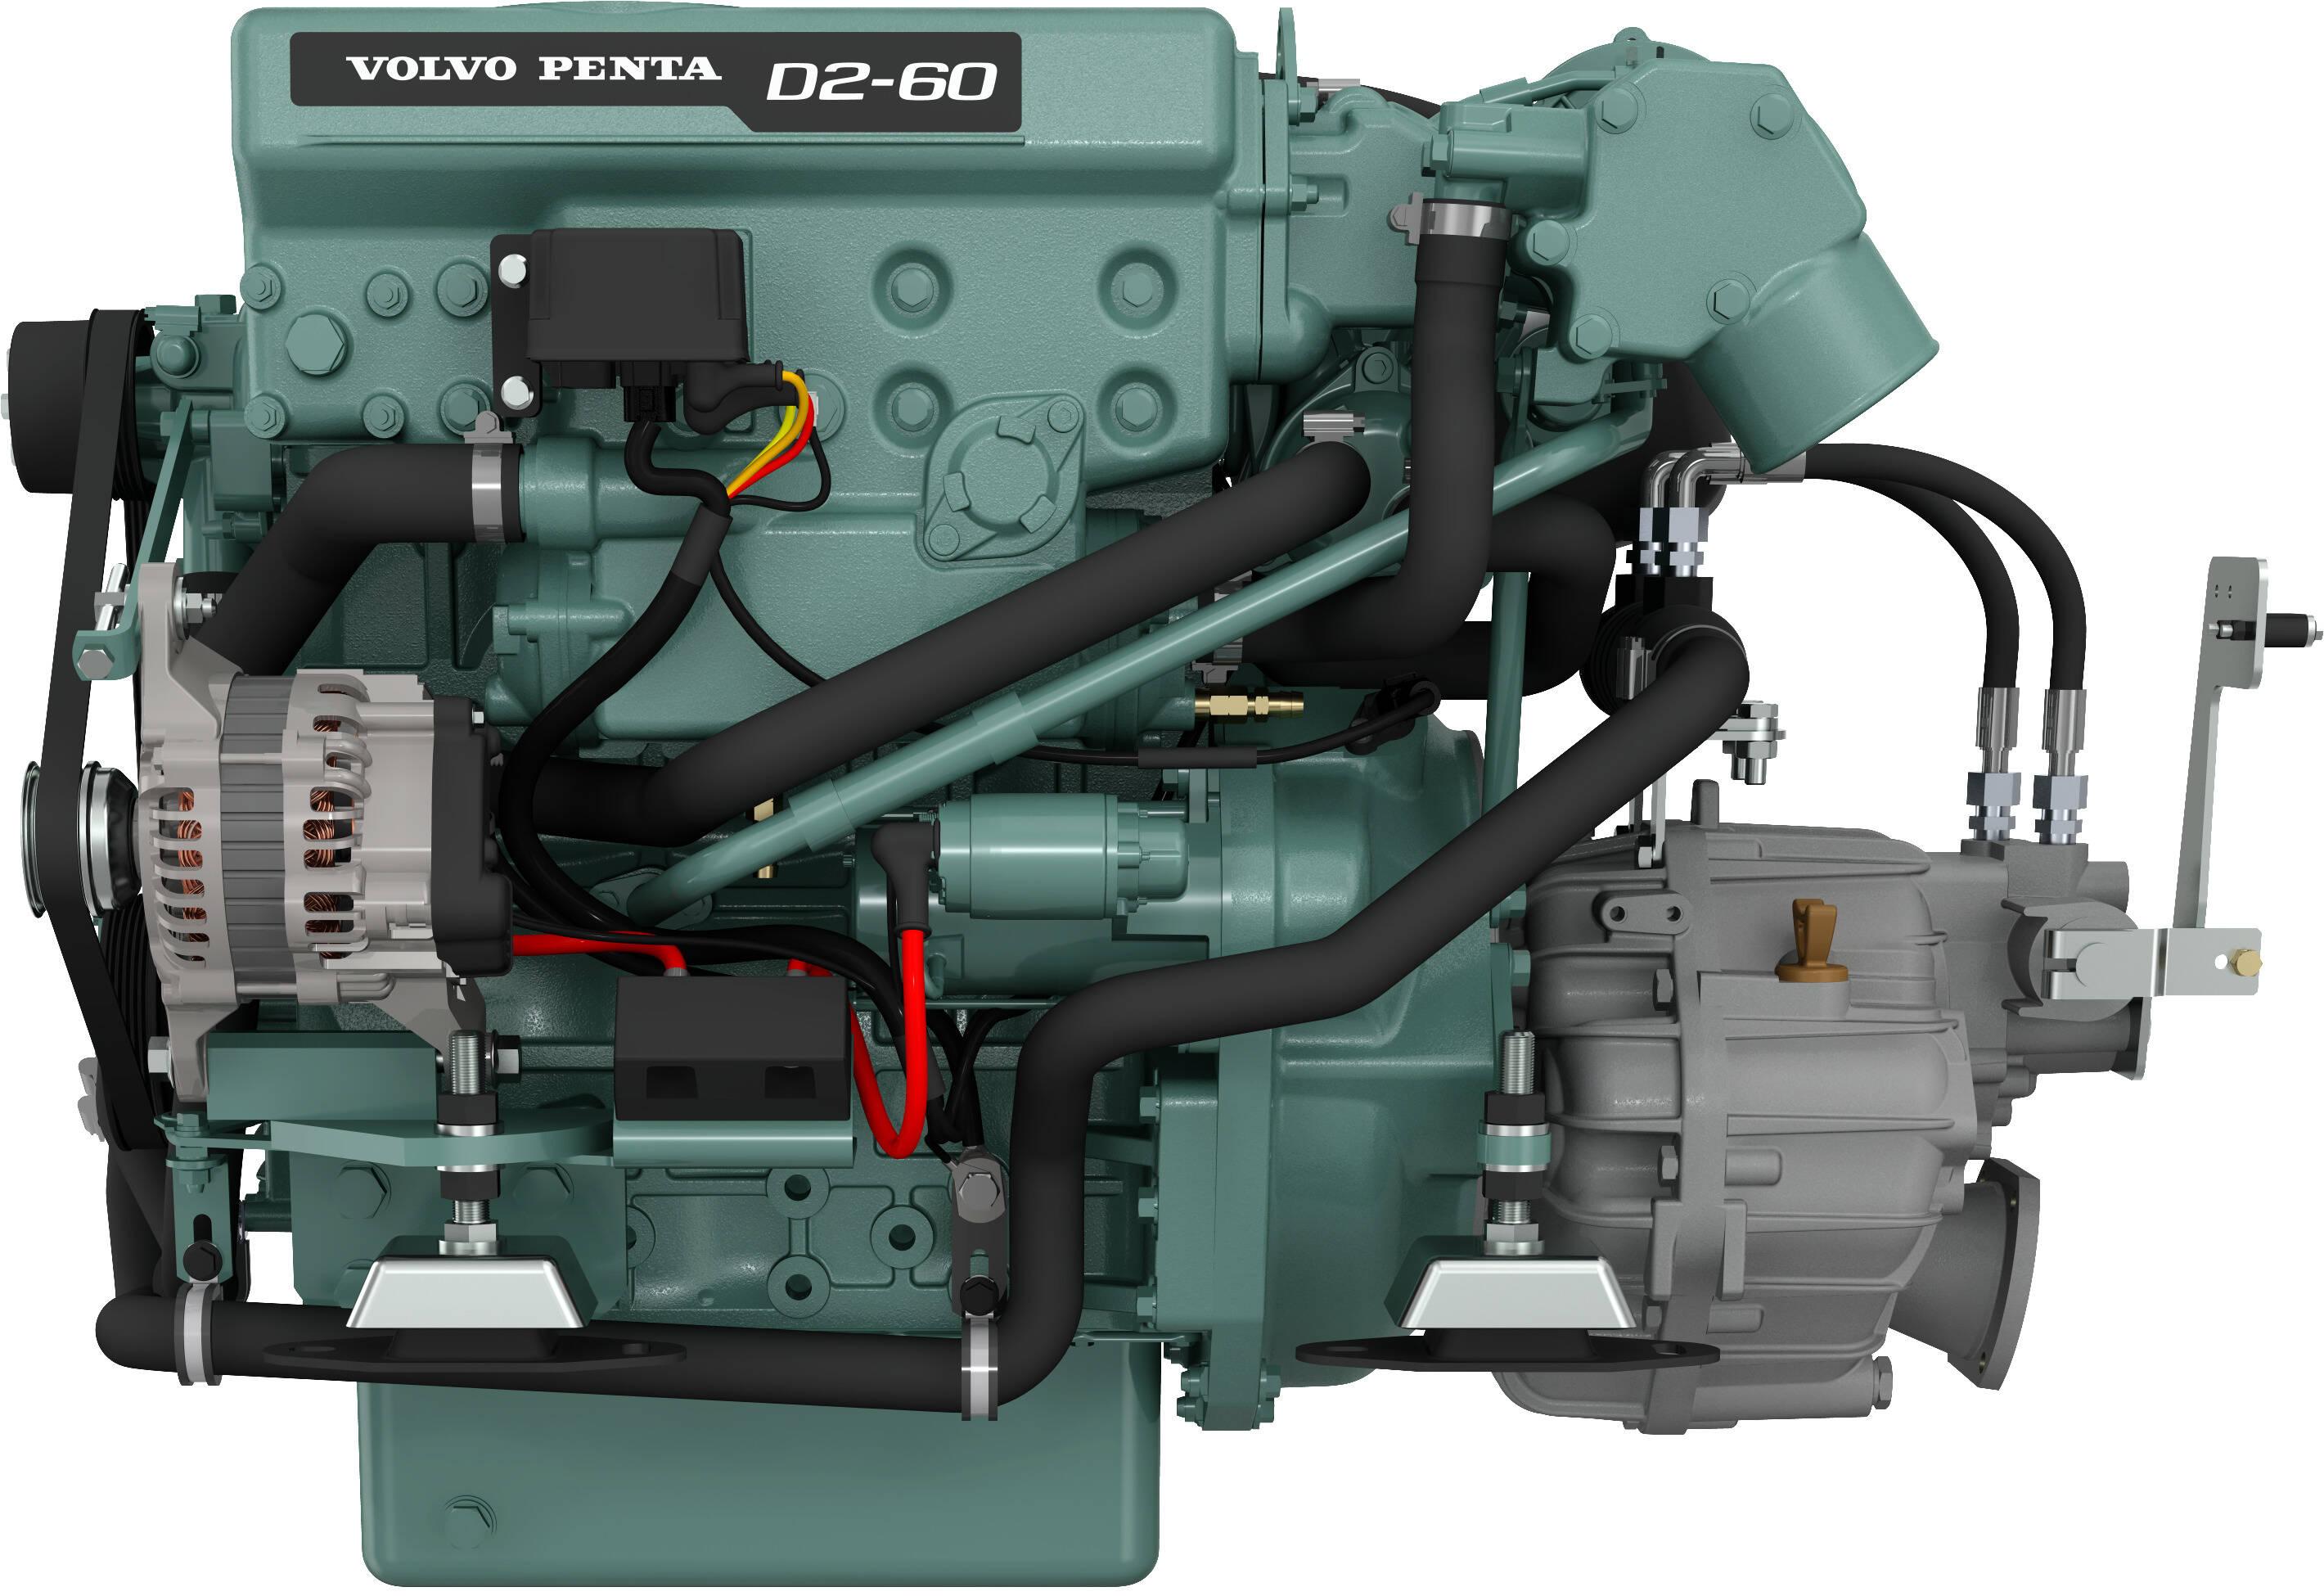 Volvo Penta D2-60 Marinediesel 60PS mit HS25 Wendegetriebe